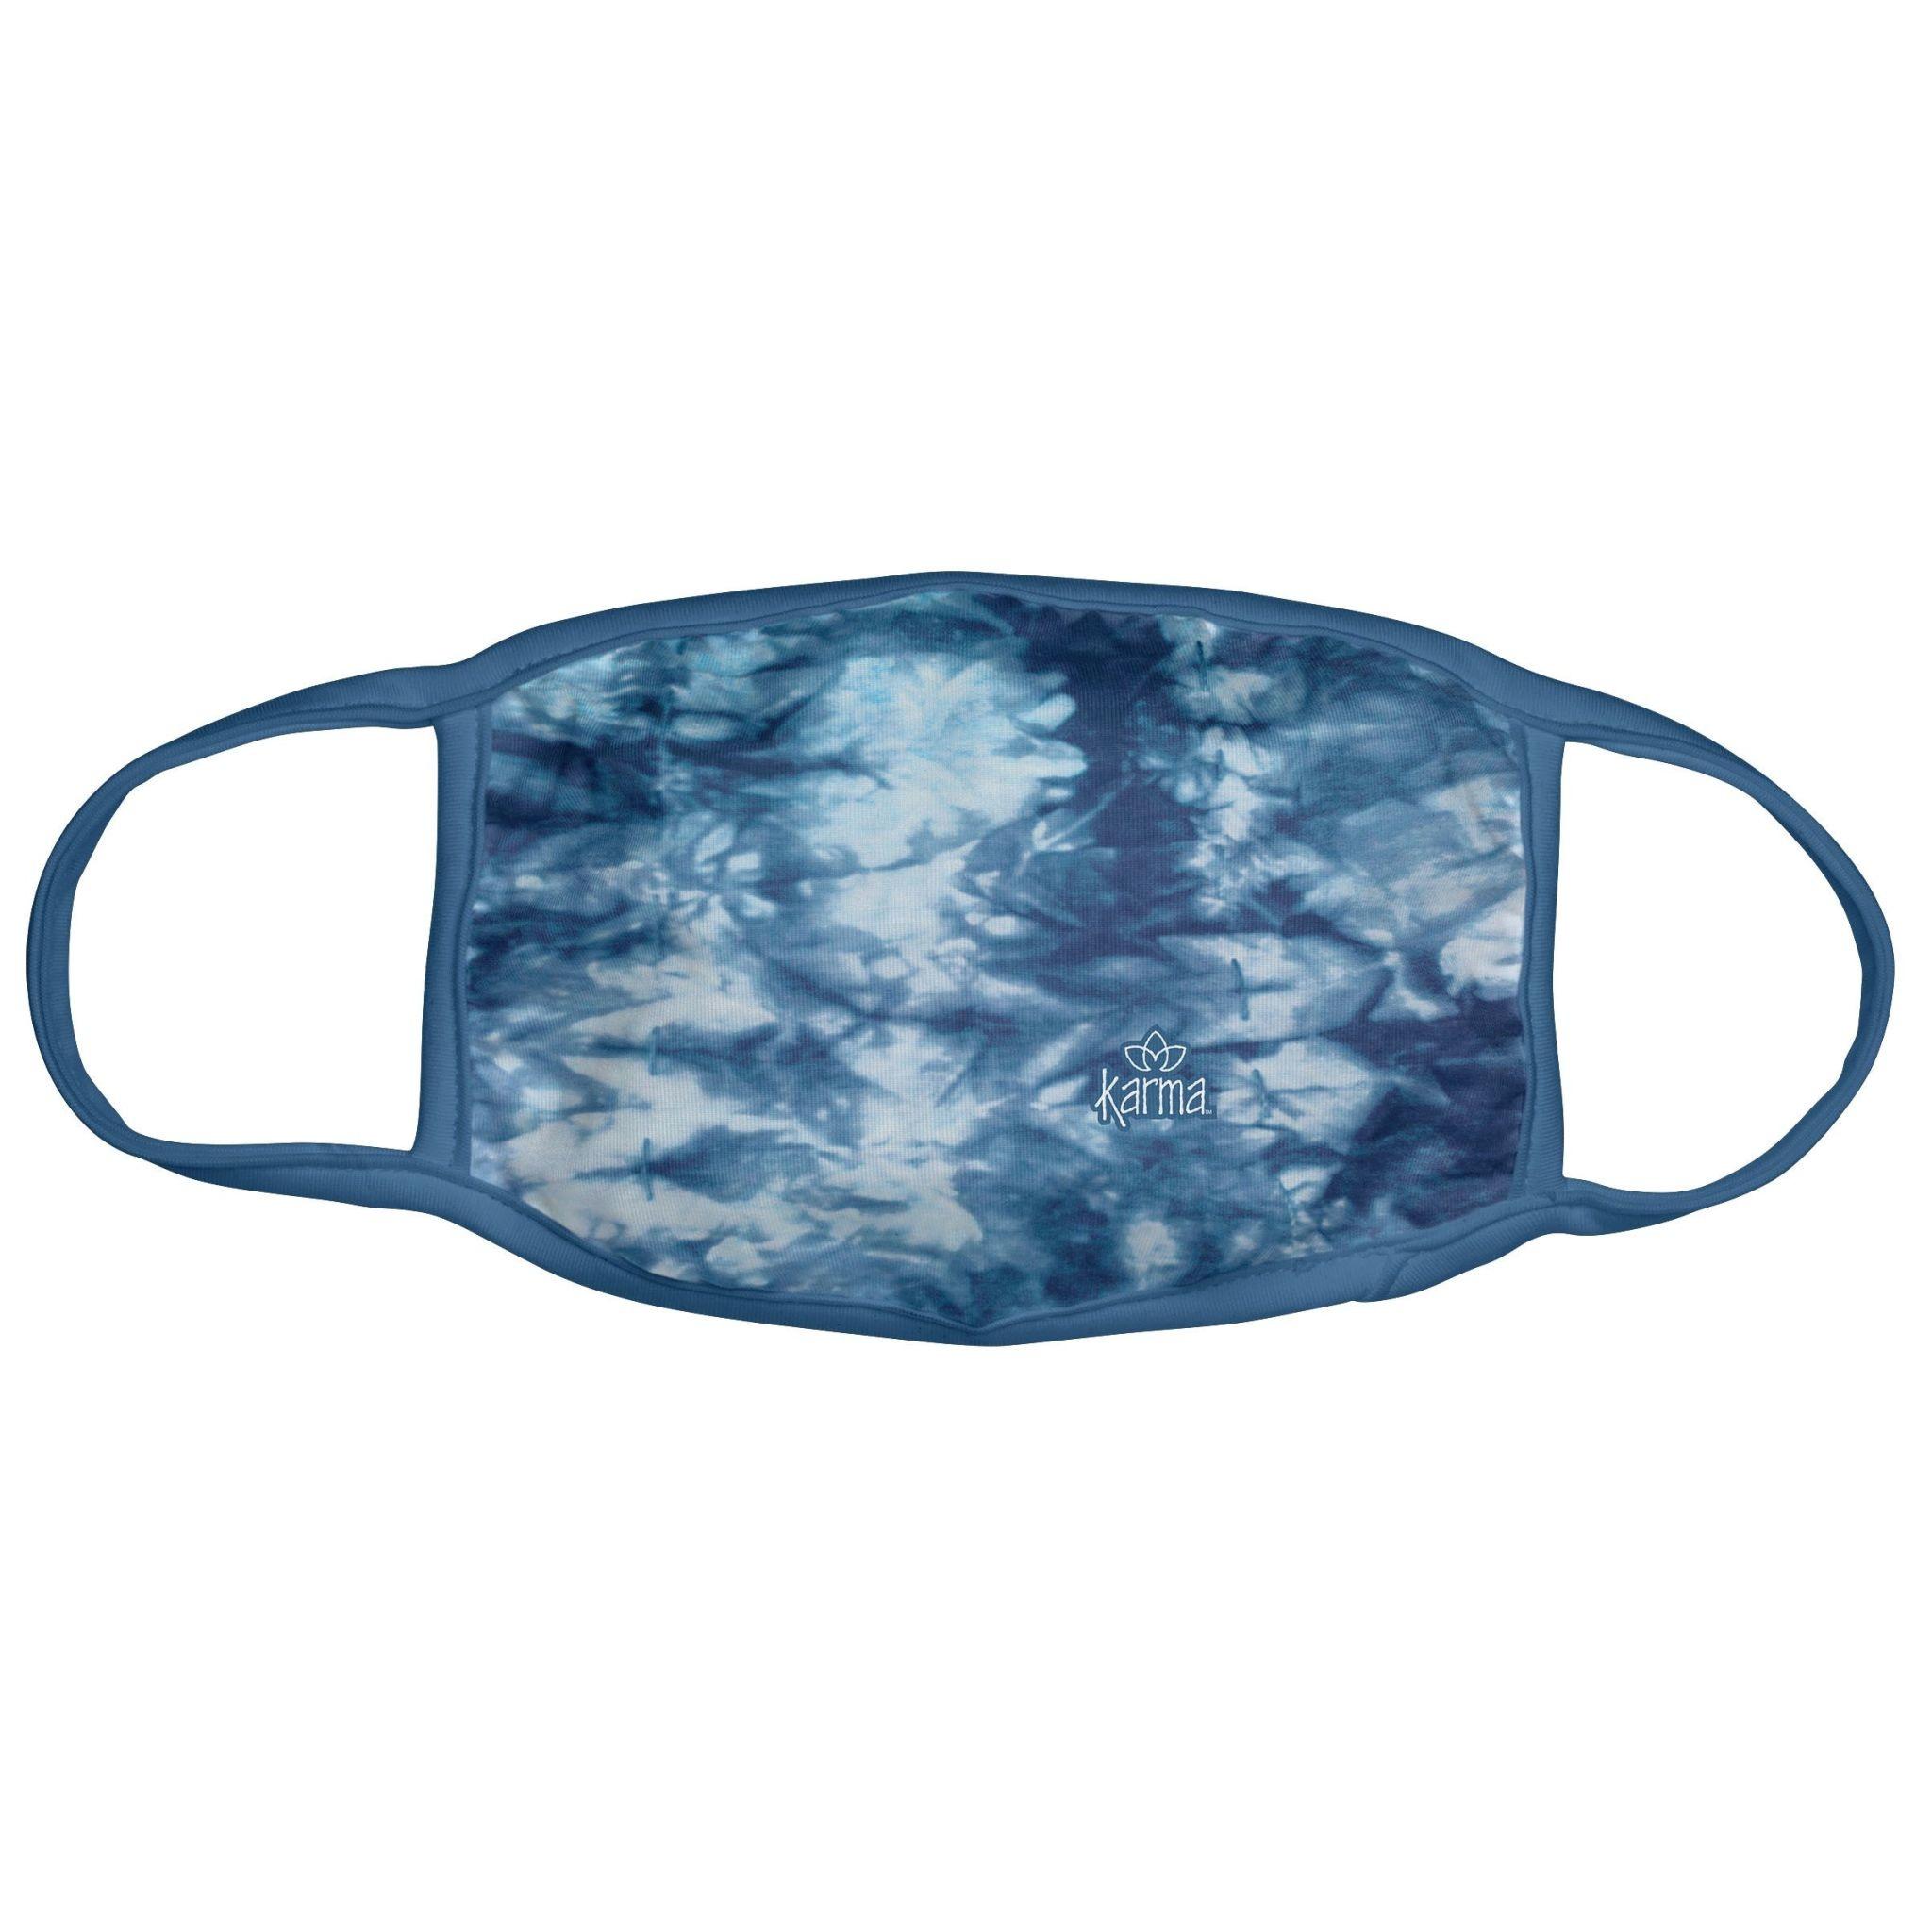 Karma Karma Face Mask - Adult - Blue Tie Dye